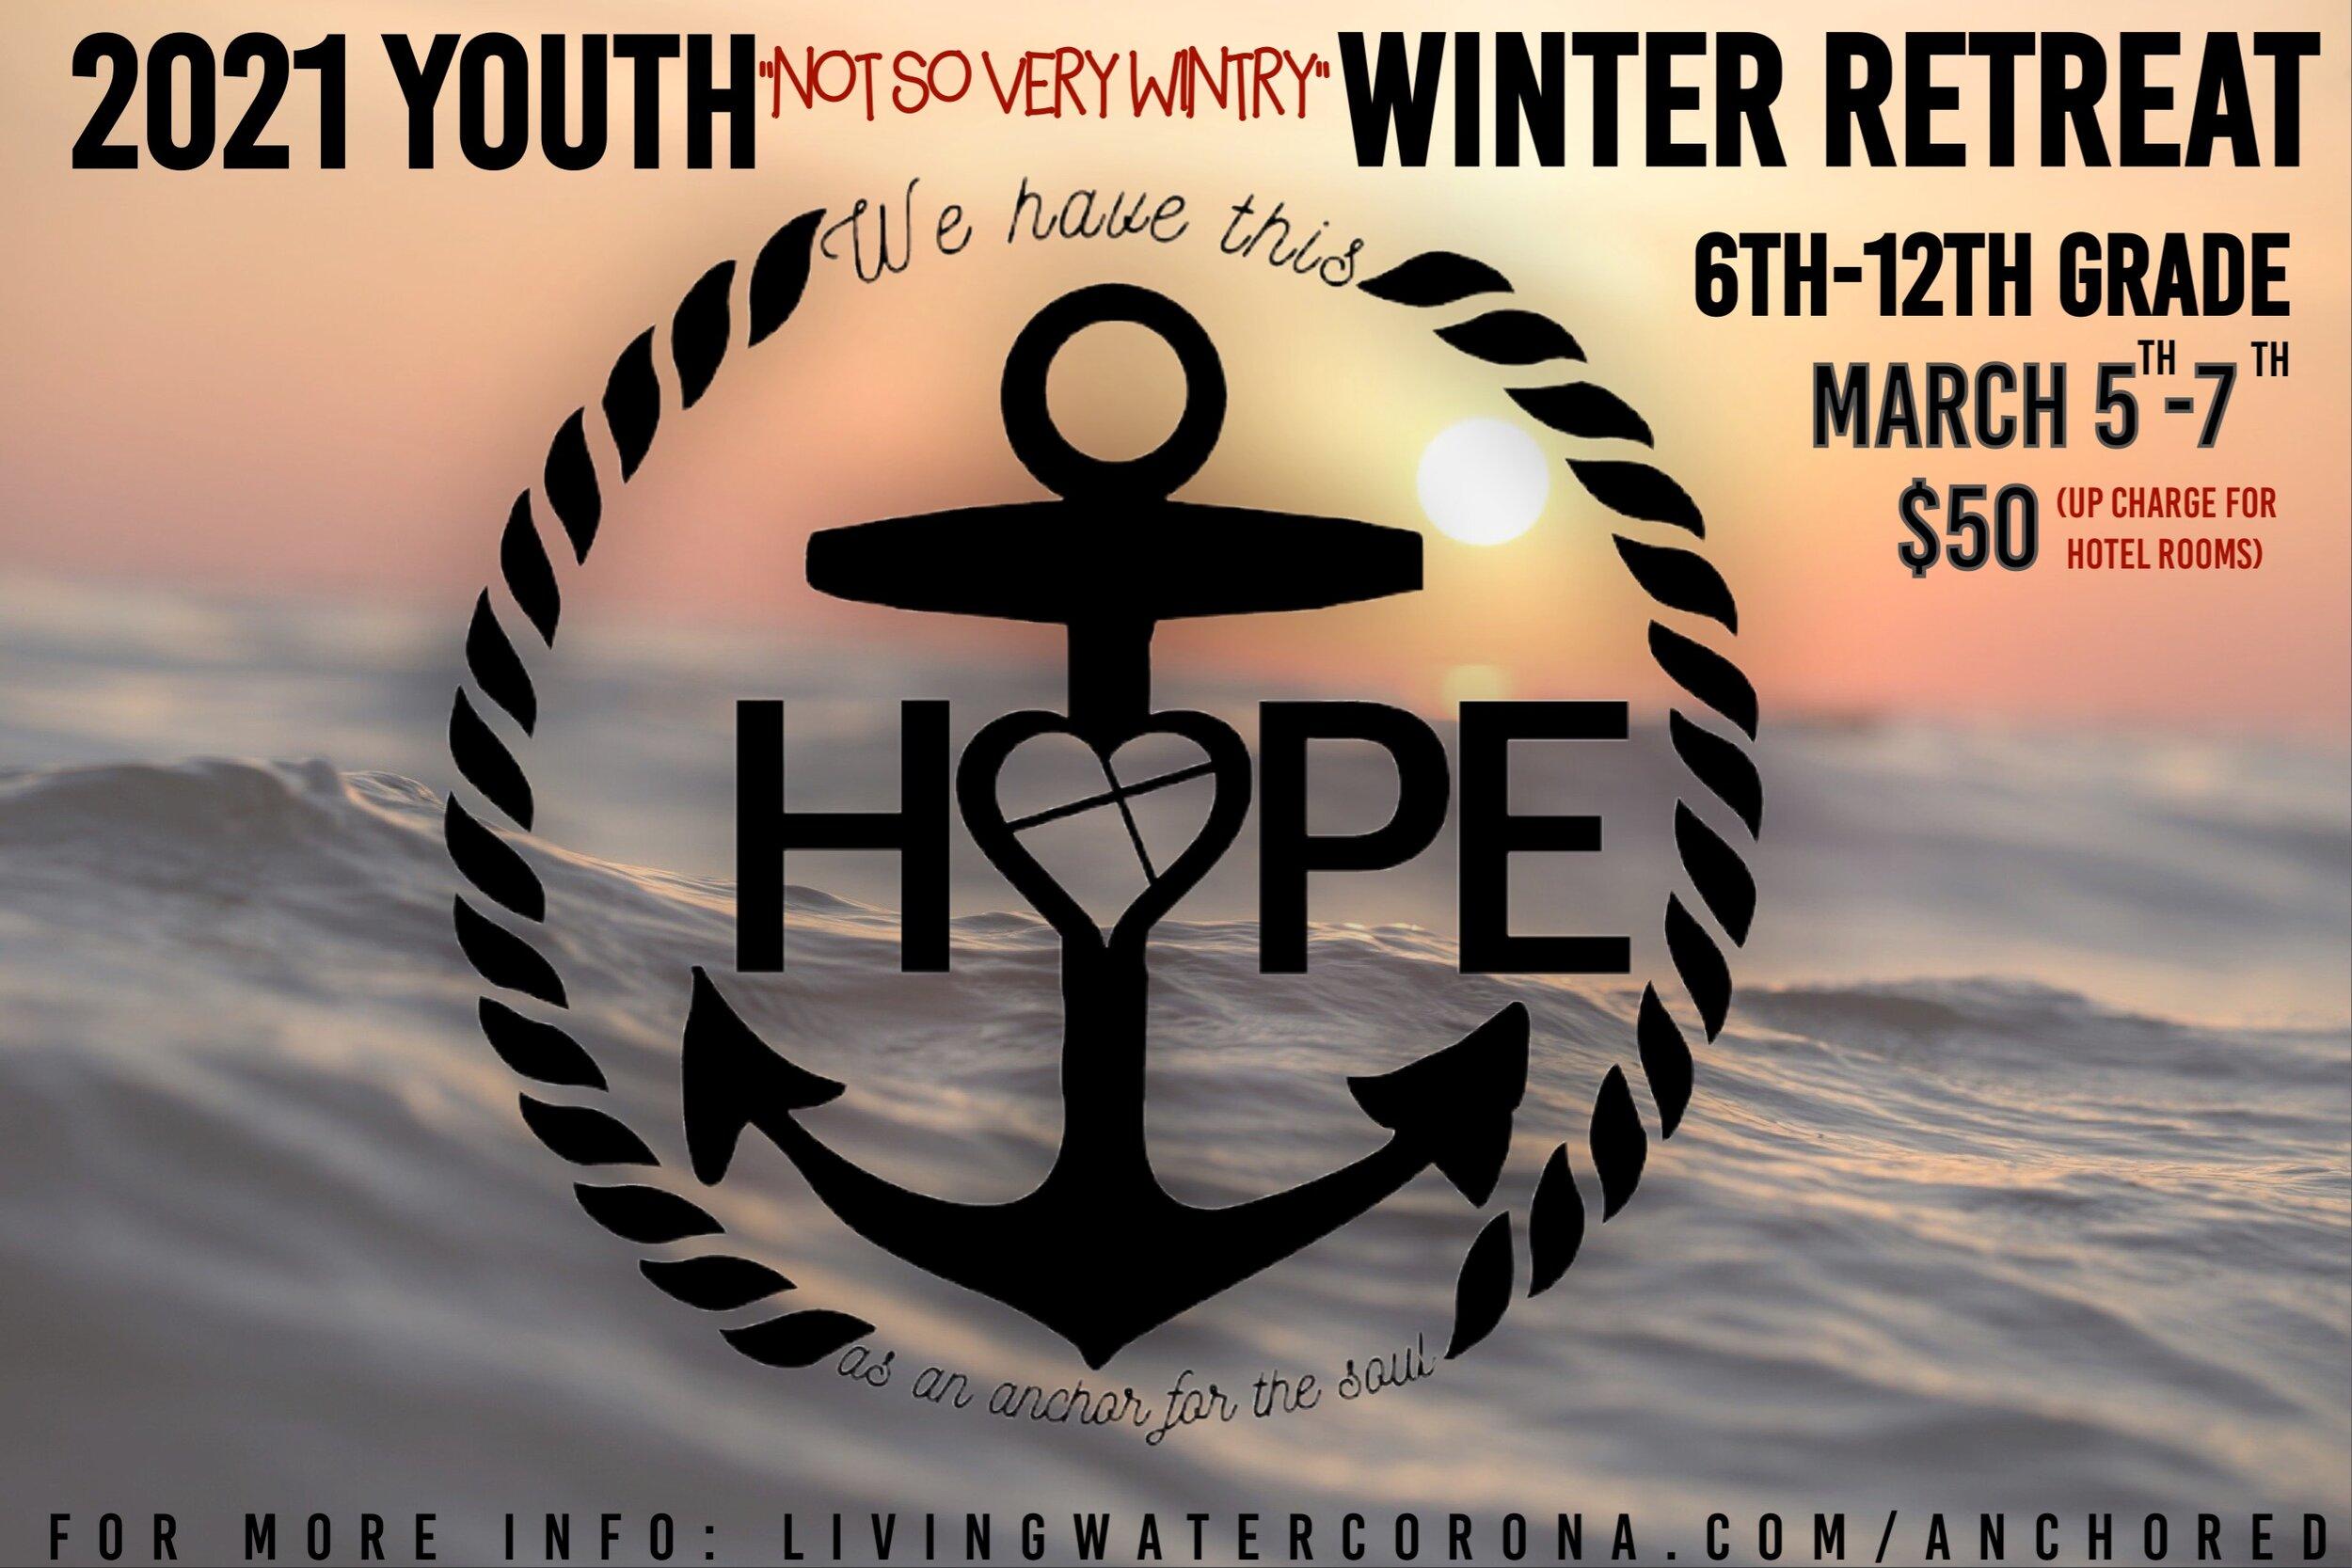 2021 Youth Winter Retreat Hotel